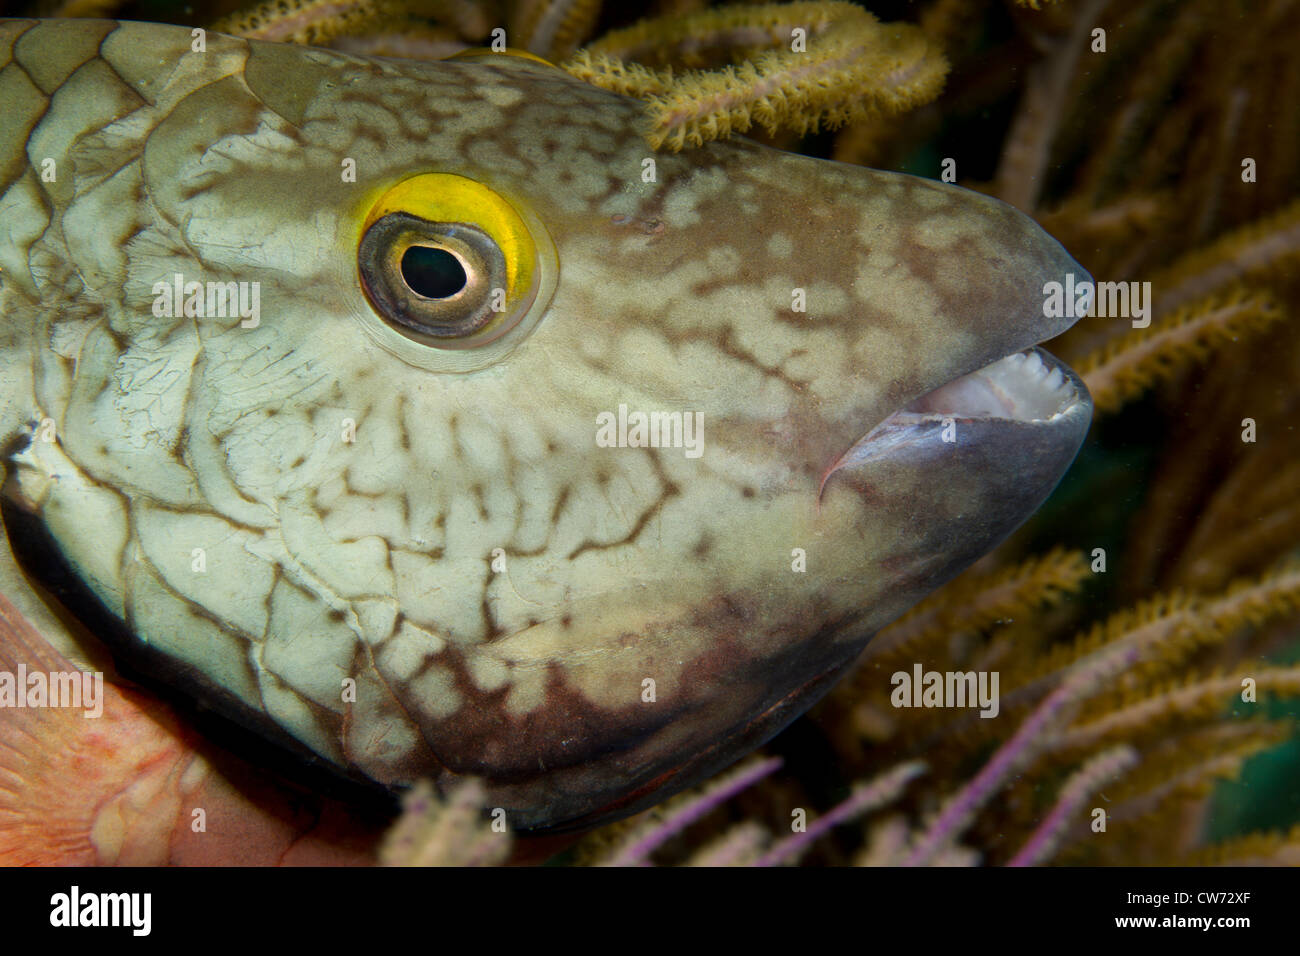 Closeup of Stoplight parrotfish (initial phase) - Stock Image